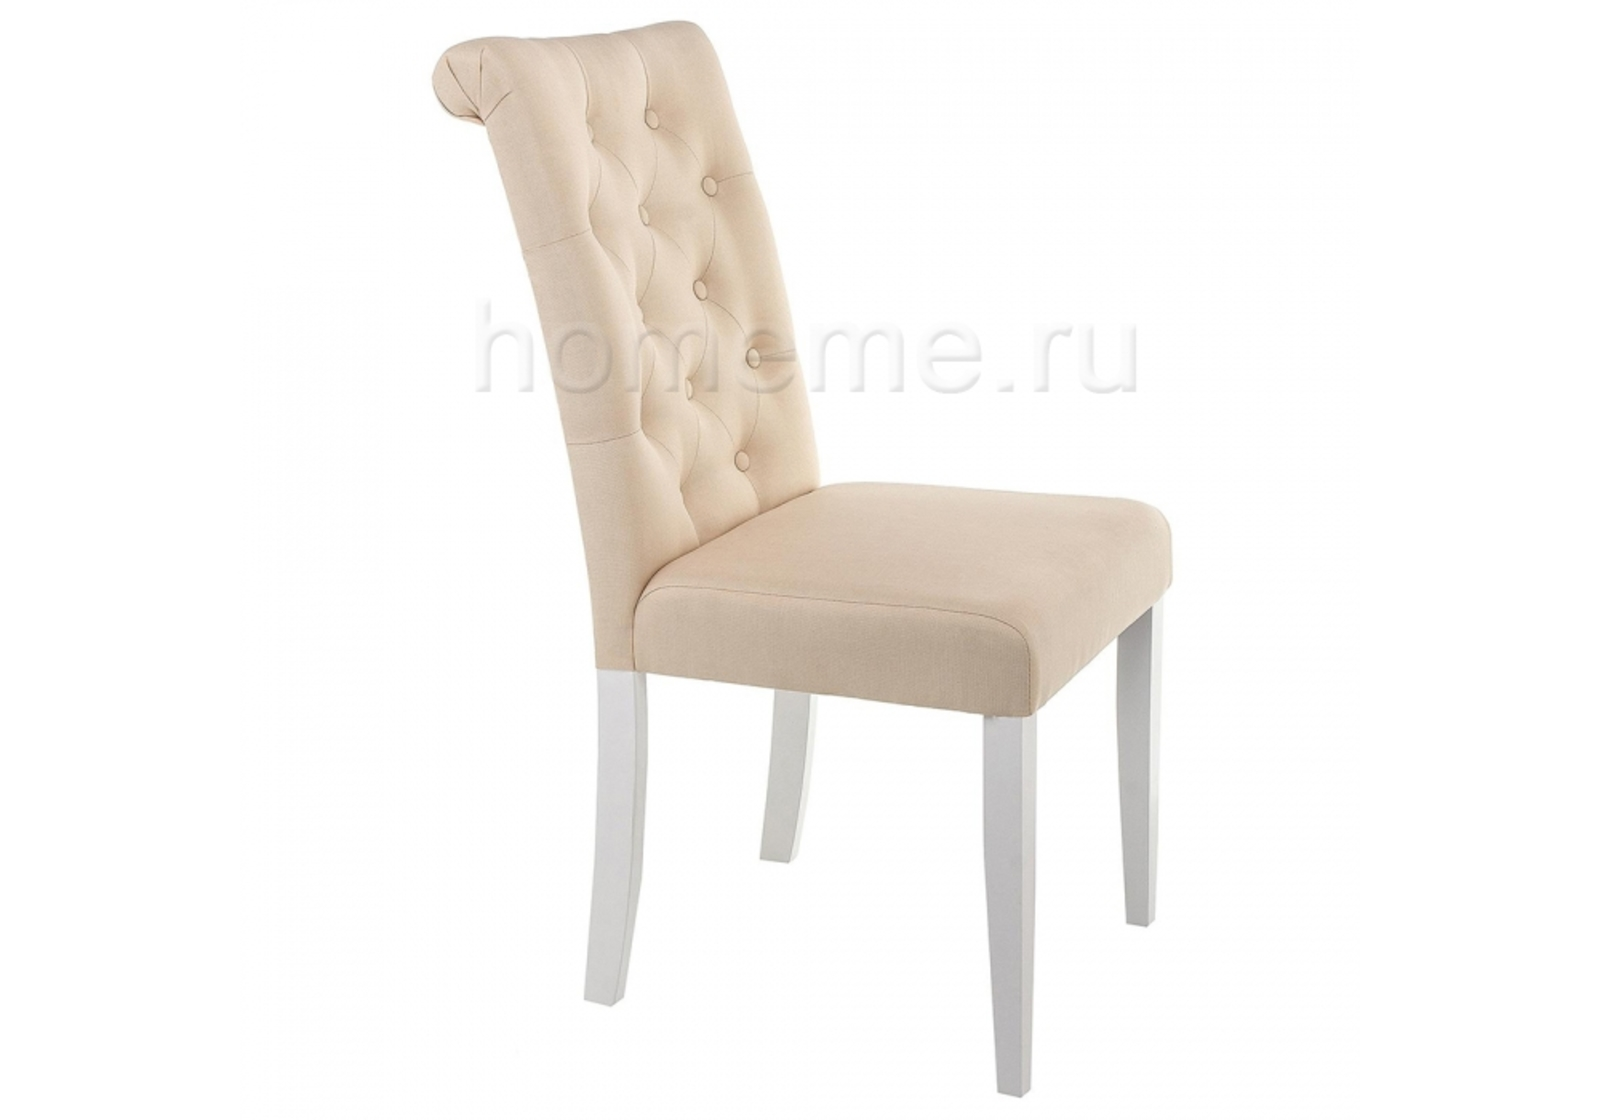 Стул HomeMe Amelia white / fabric cream 11021 от Homeme.ru